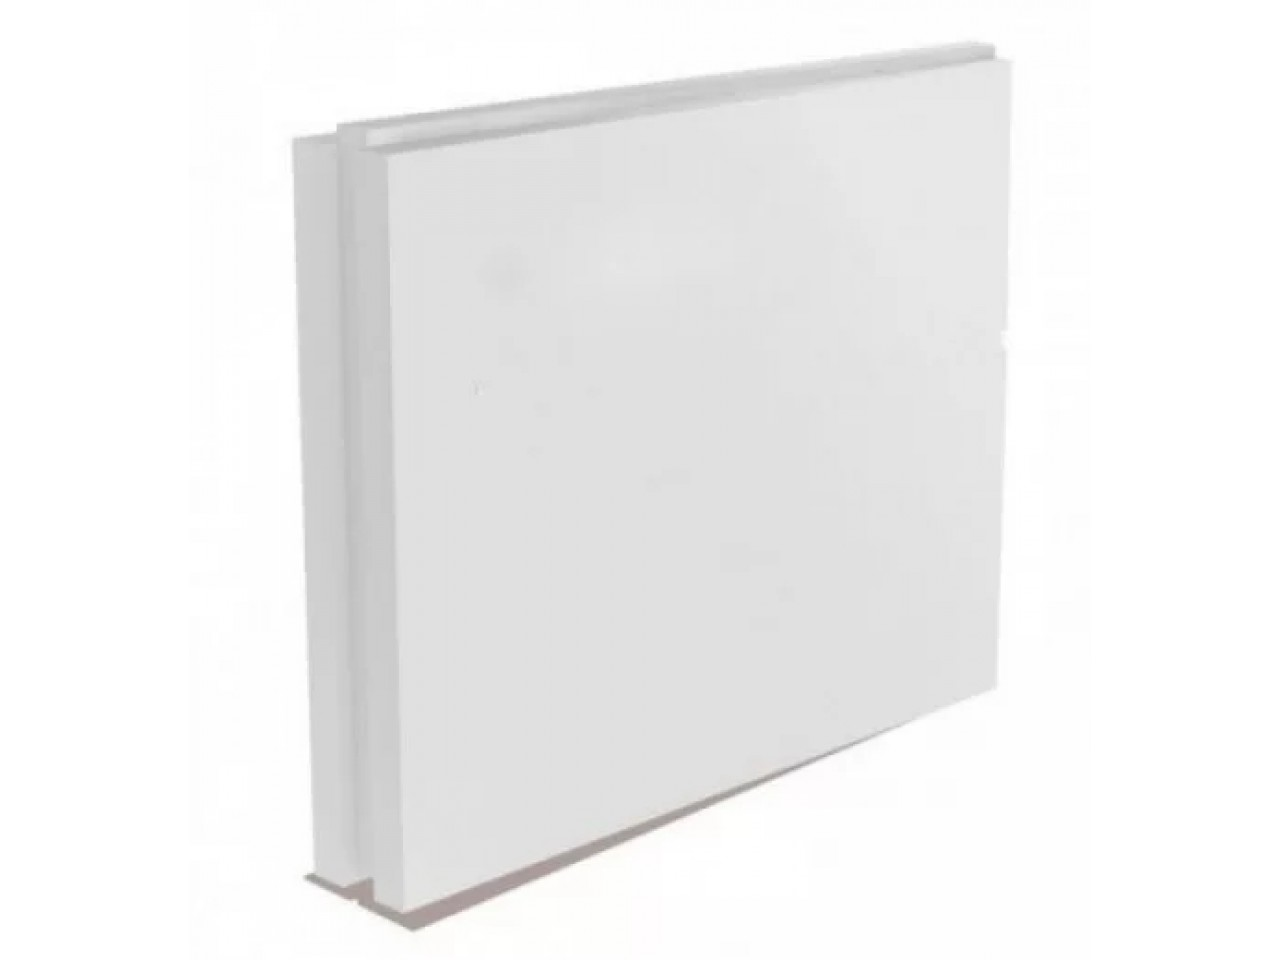 Гипсовая пазогребневая плита KNAUF 80x500x667